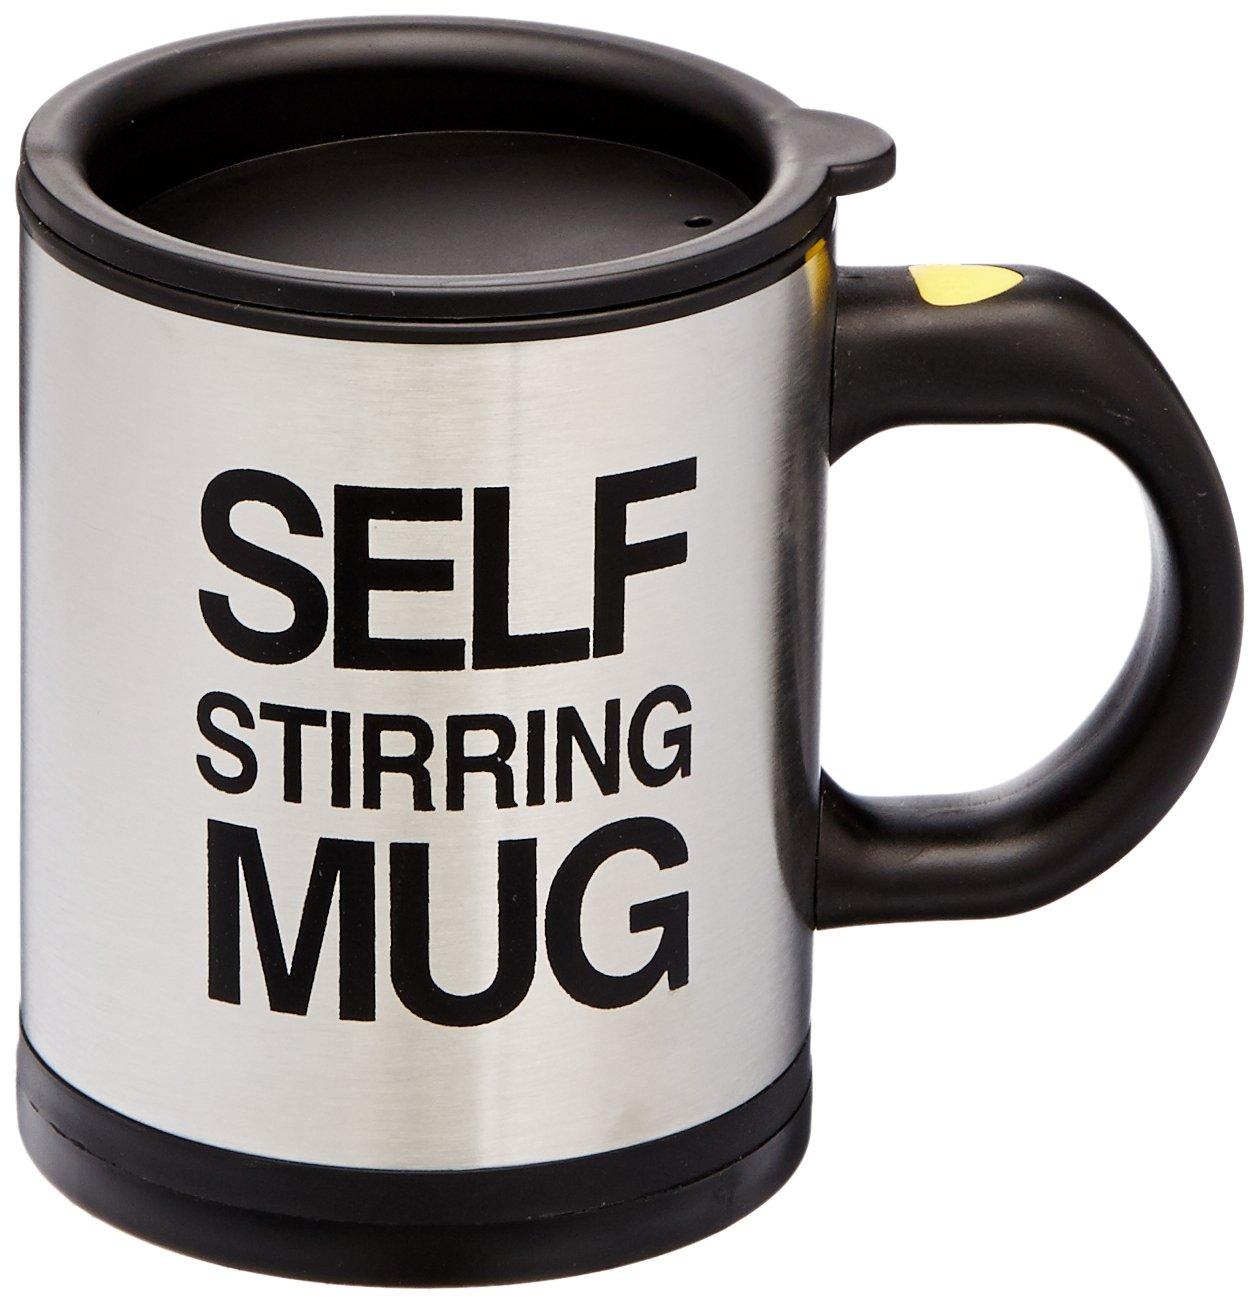 Célèbre Fun Gadgets Plain lazy - self stiring mug: Amazon.fr: Cuisine & Maison VP29